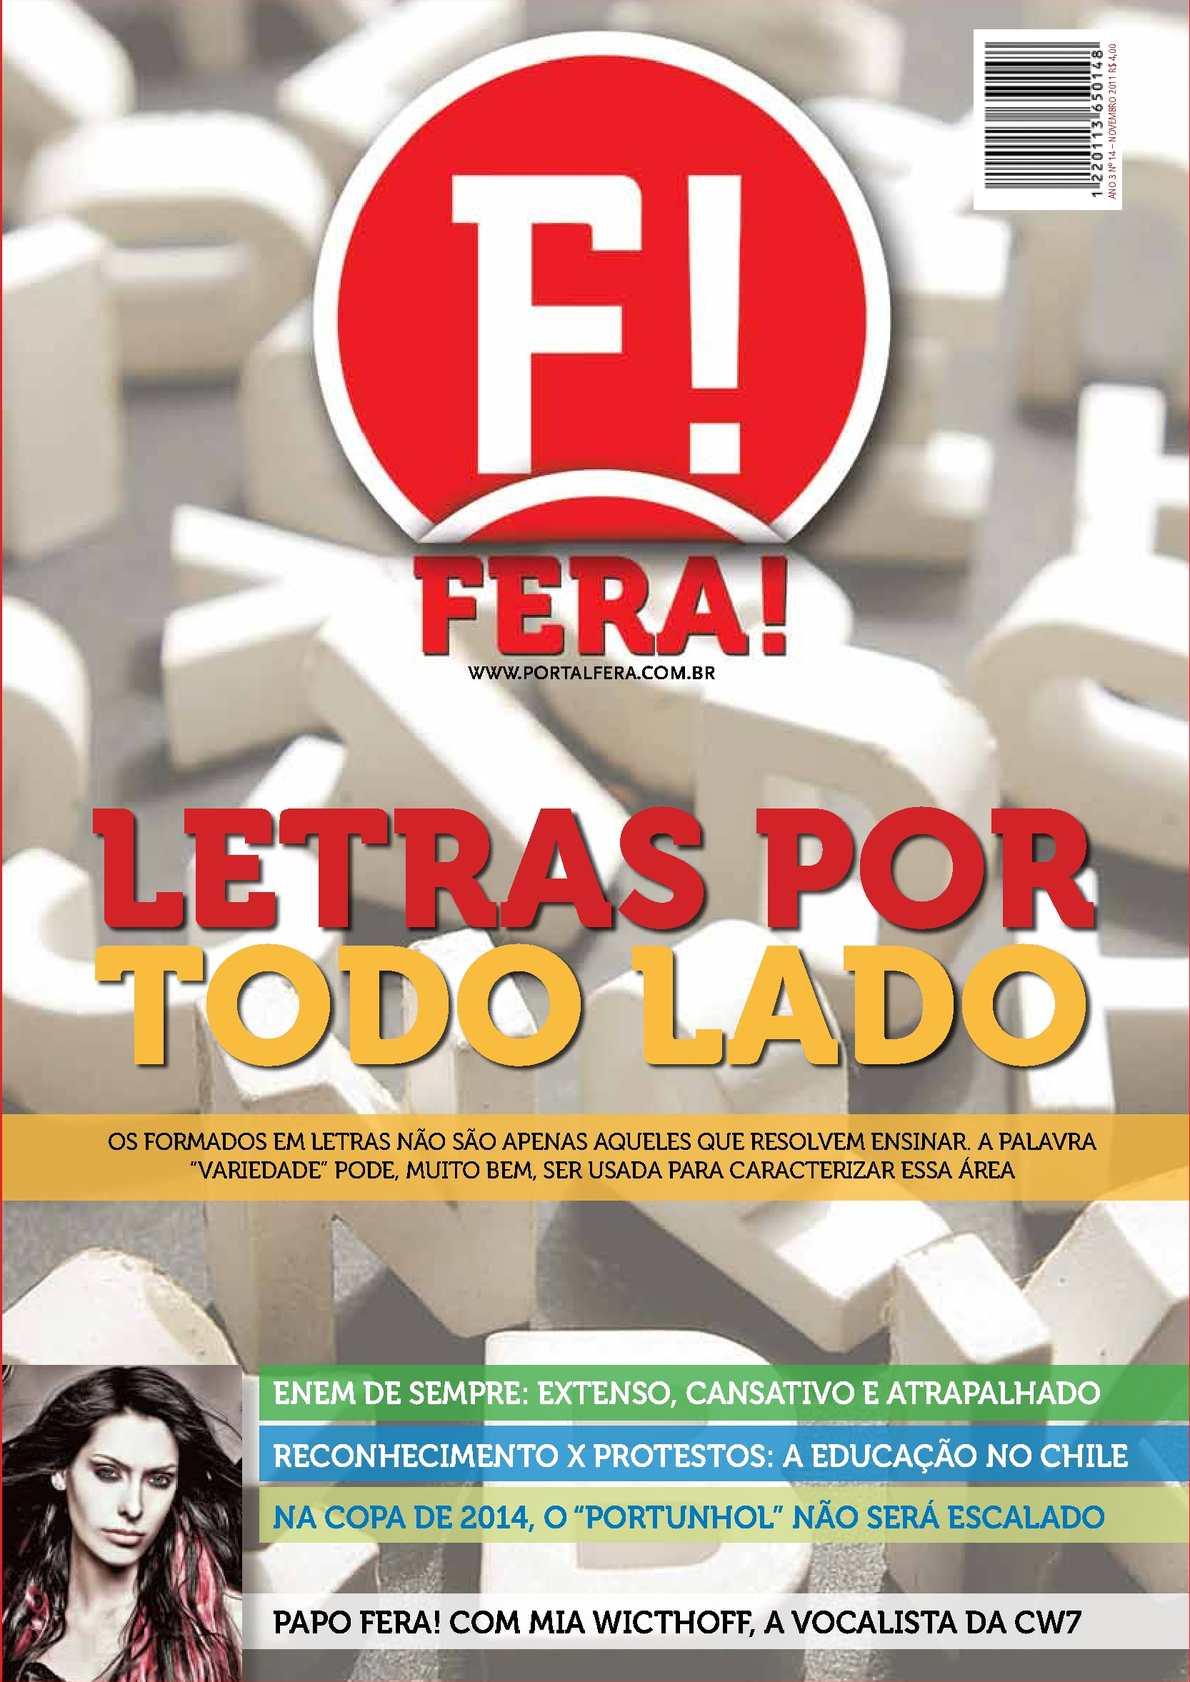 Calaméo - Revista Fera! ed. 14 6123425f10ae1